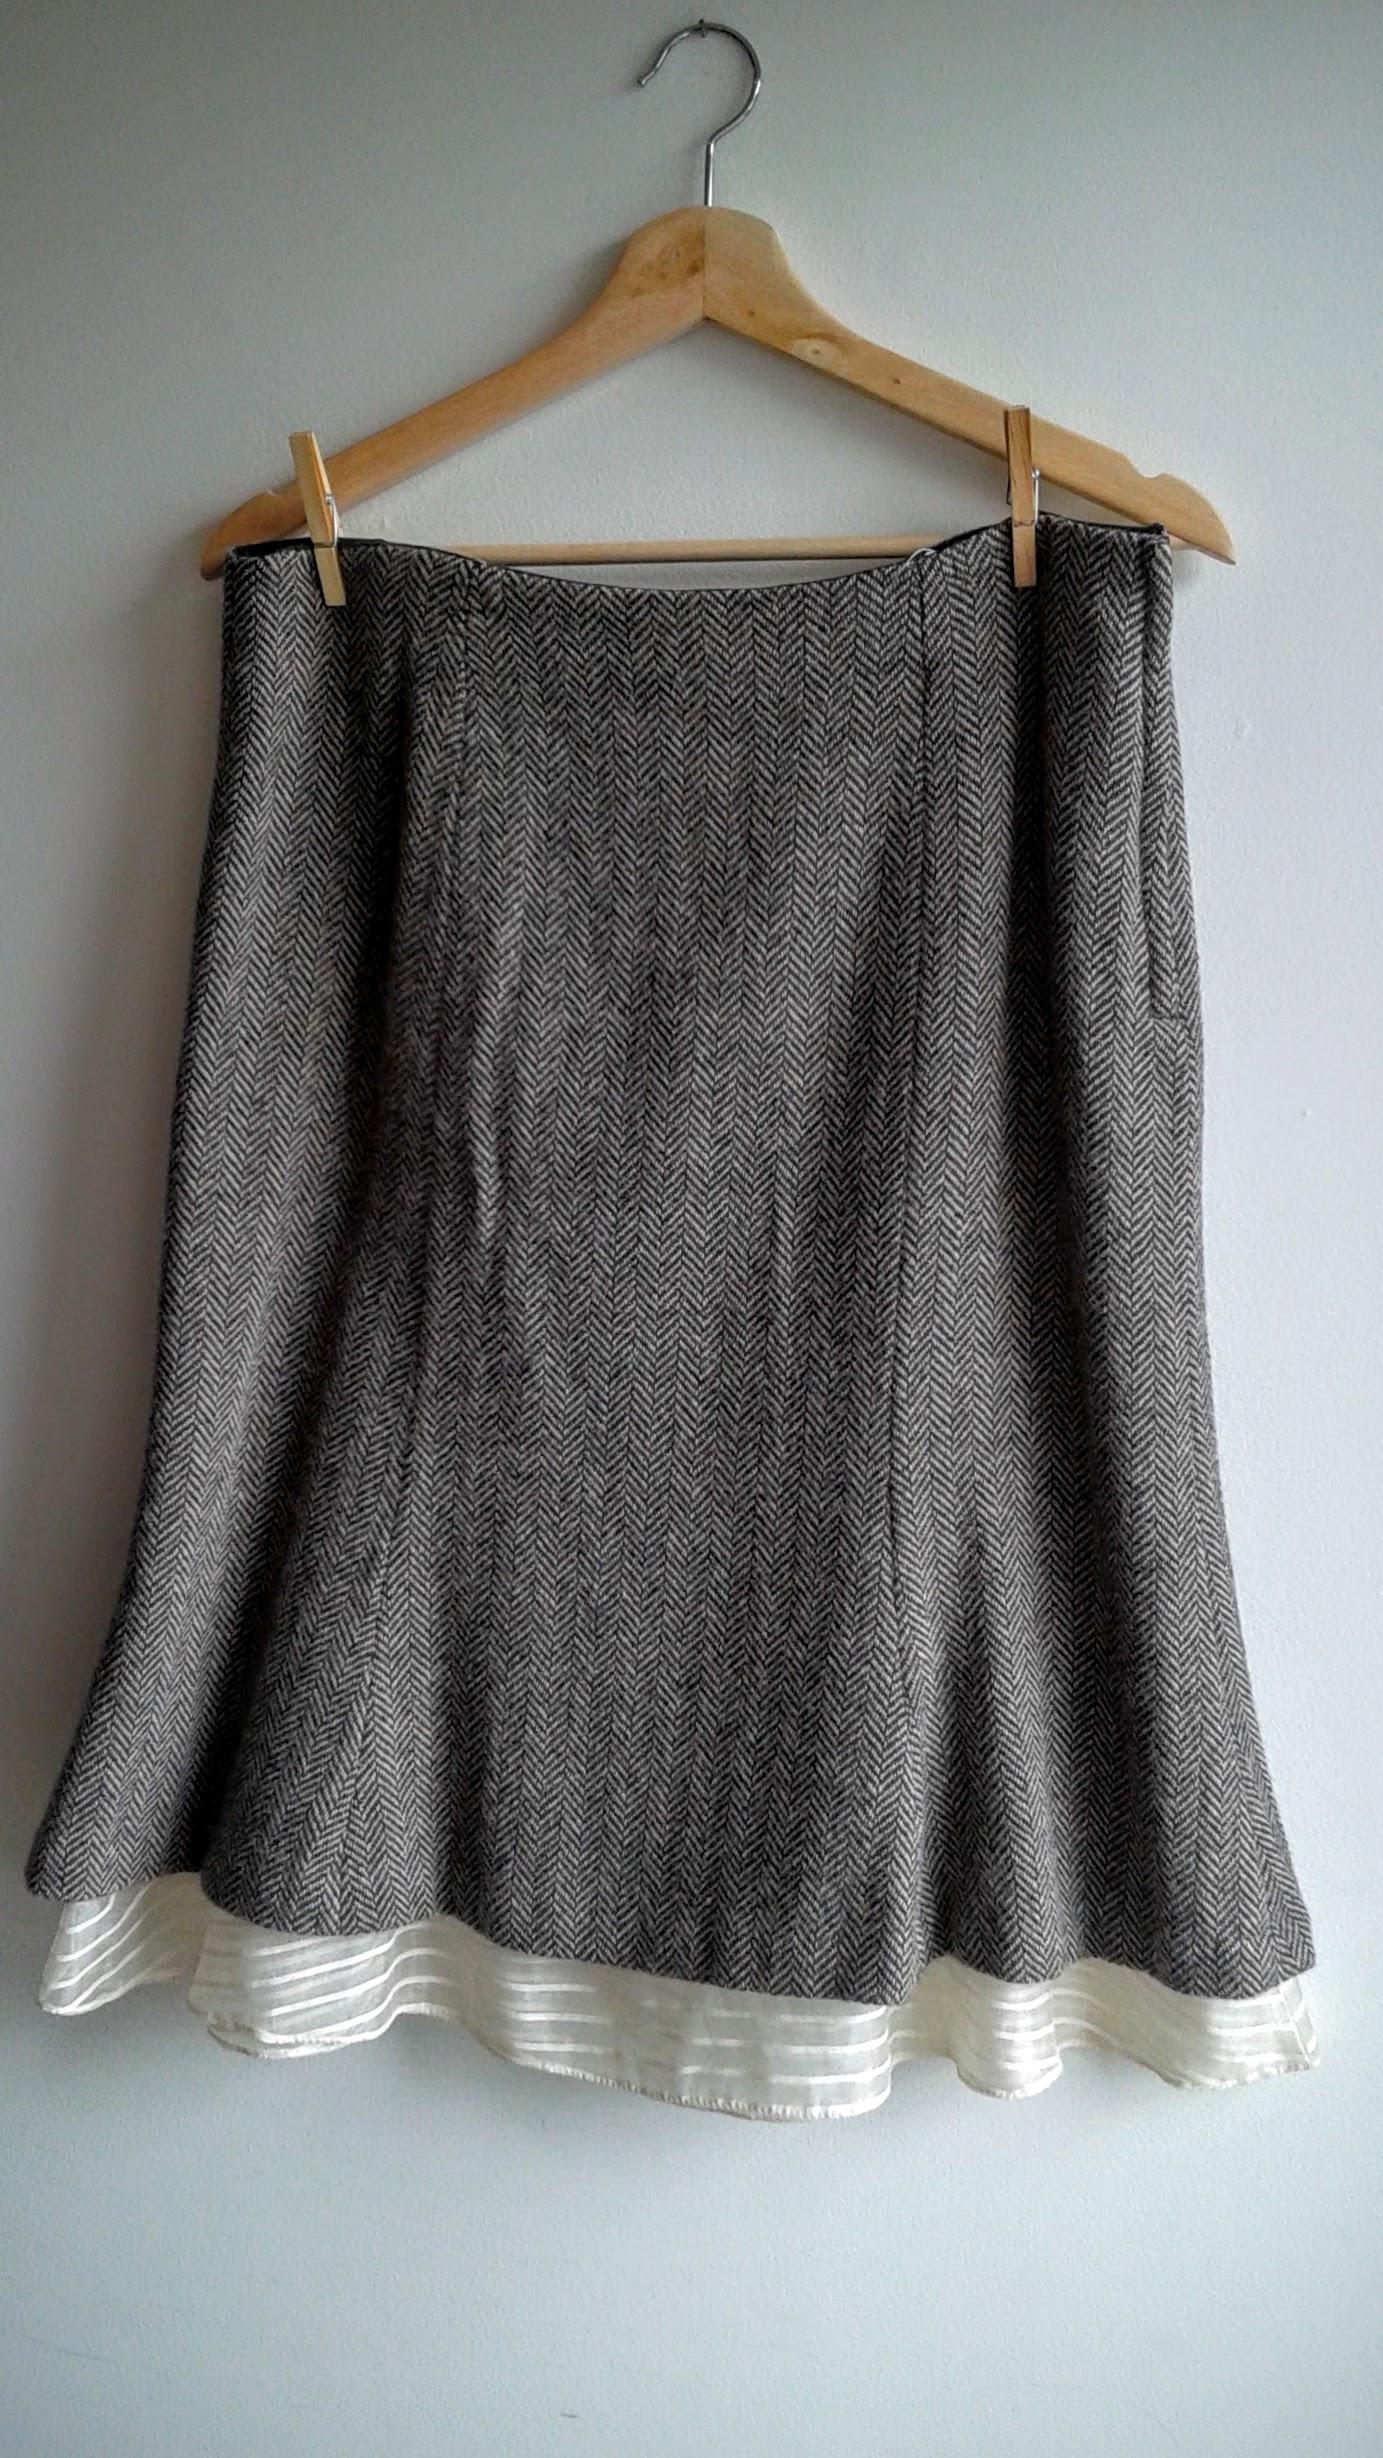 Gap skirt; Size 10, $22